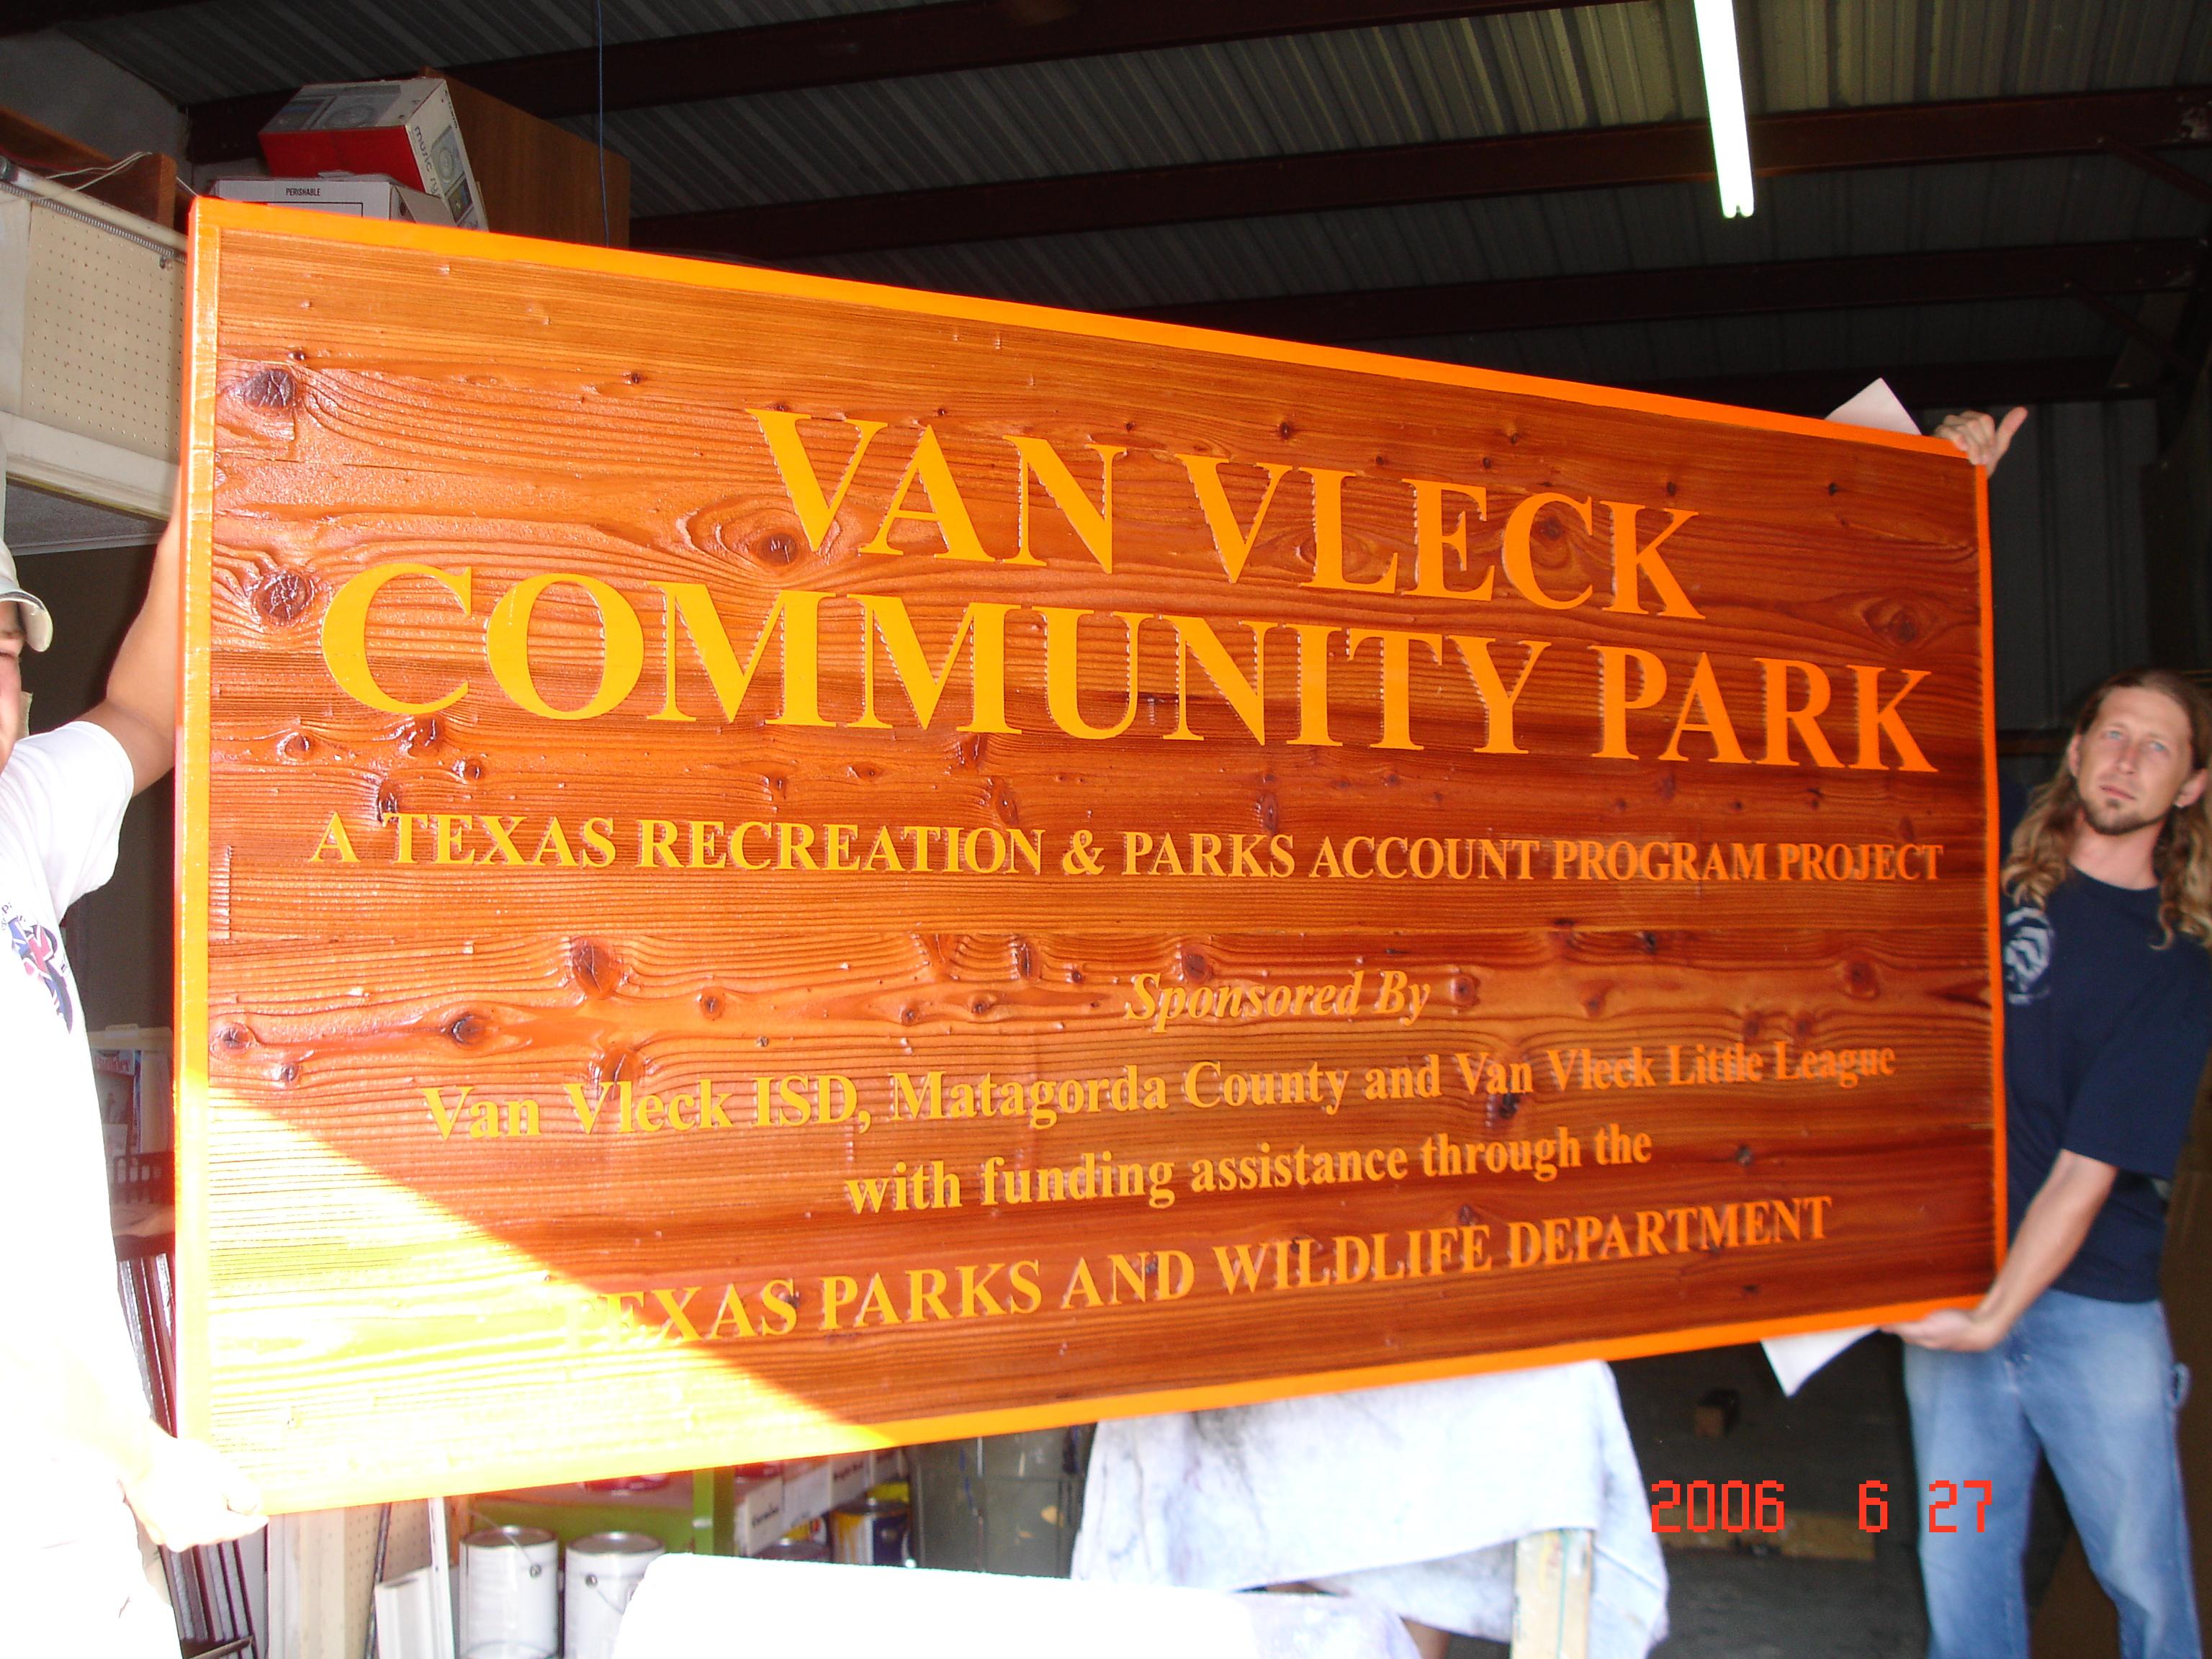 Van Vleck - lk7662.JPG